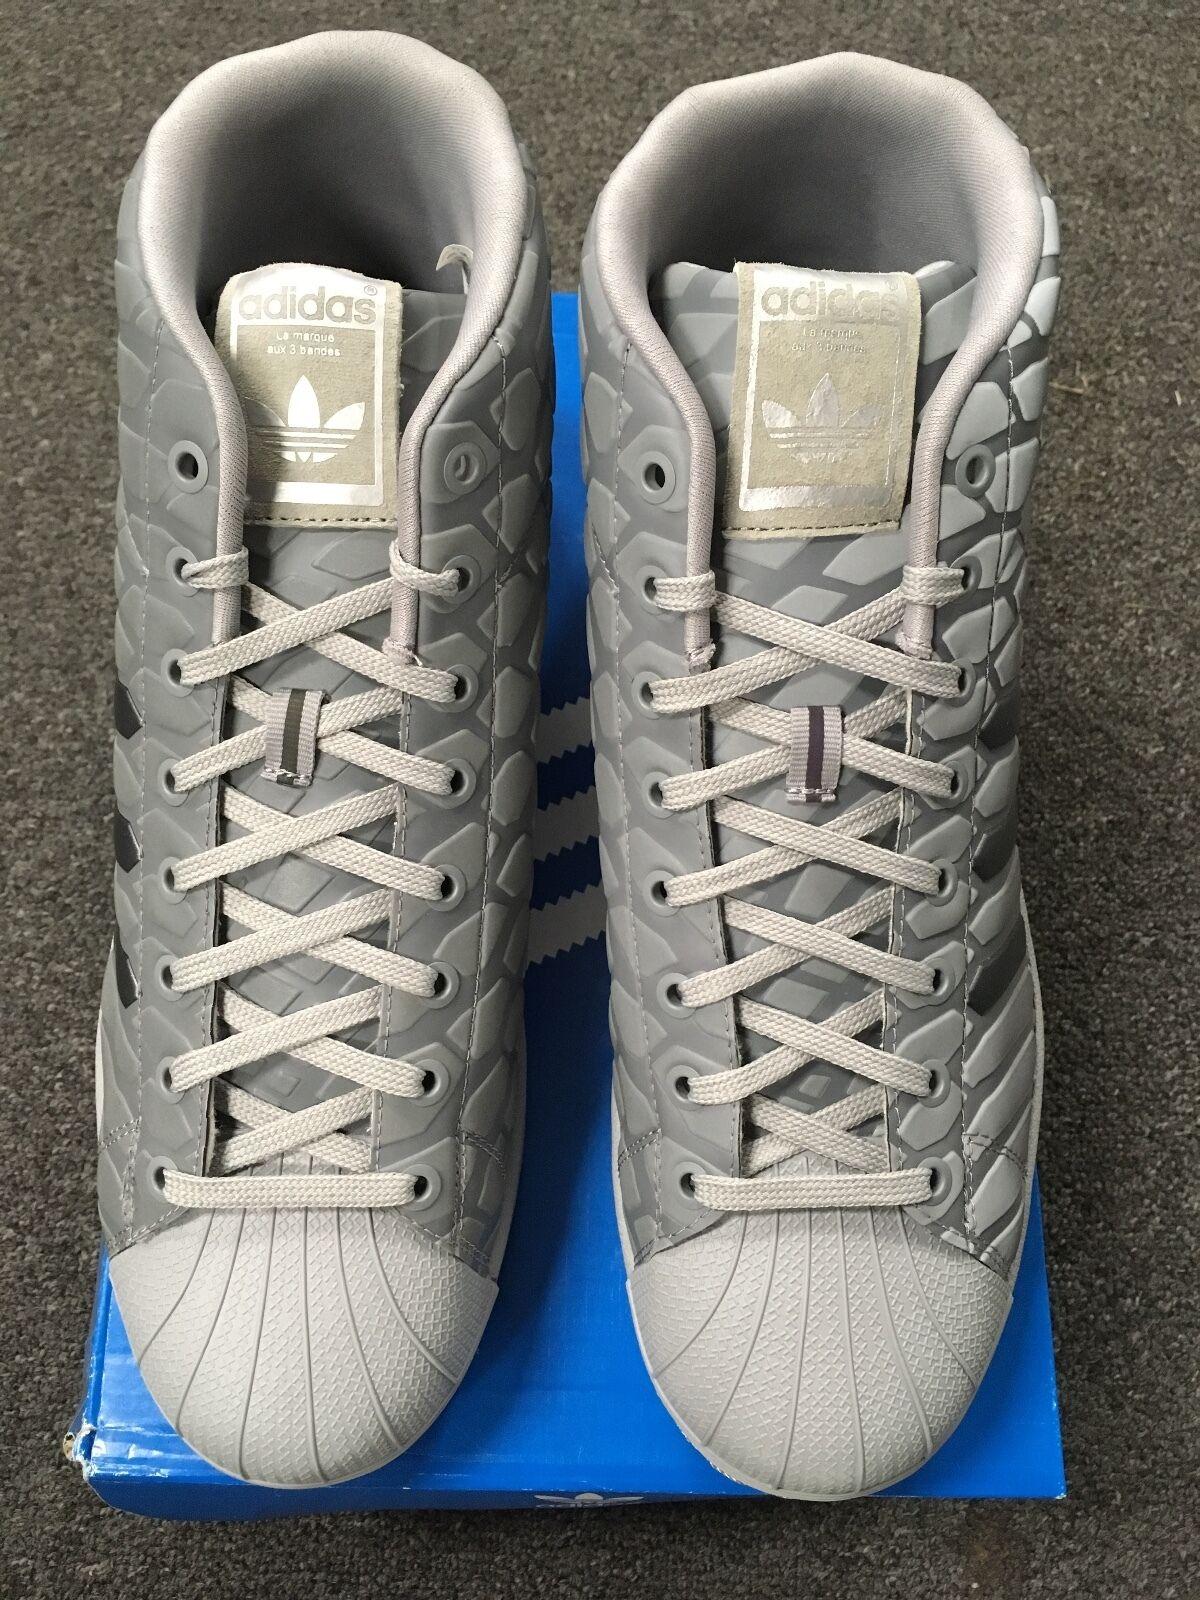 Neue adidas turnschuhe pro model shell die turnschuhe adidas (grau) 402571